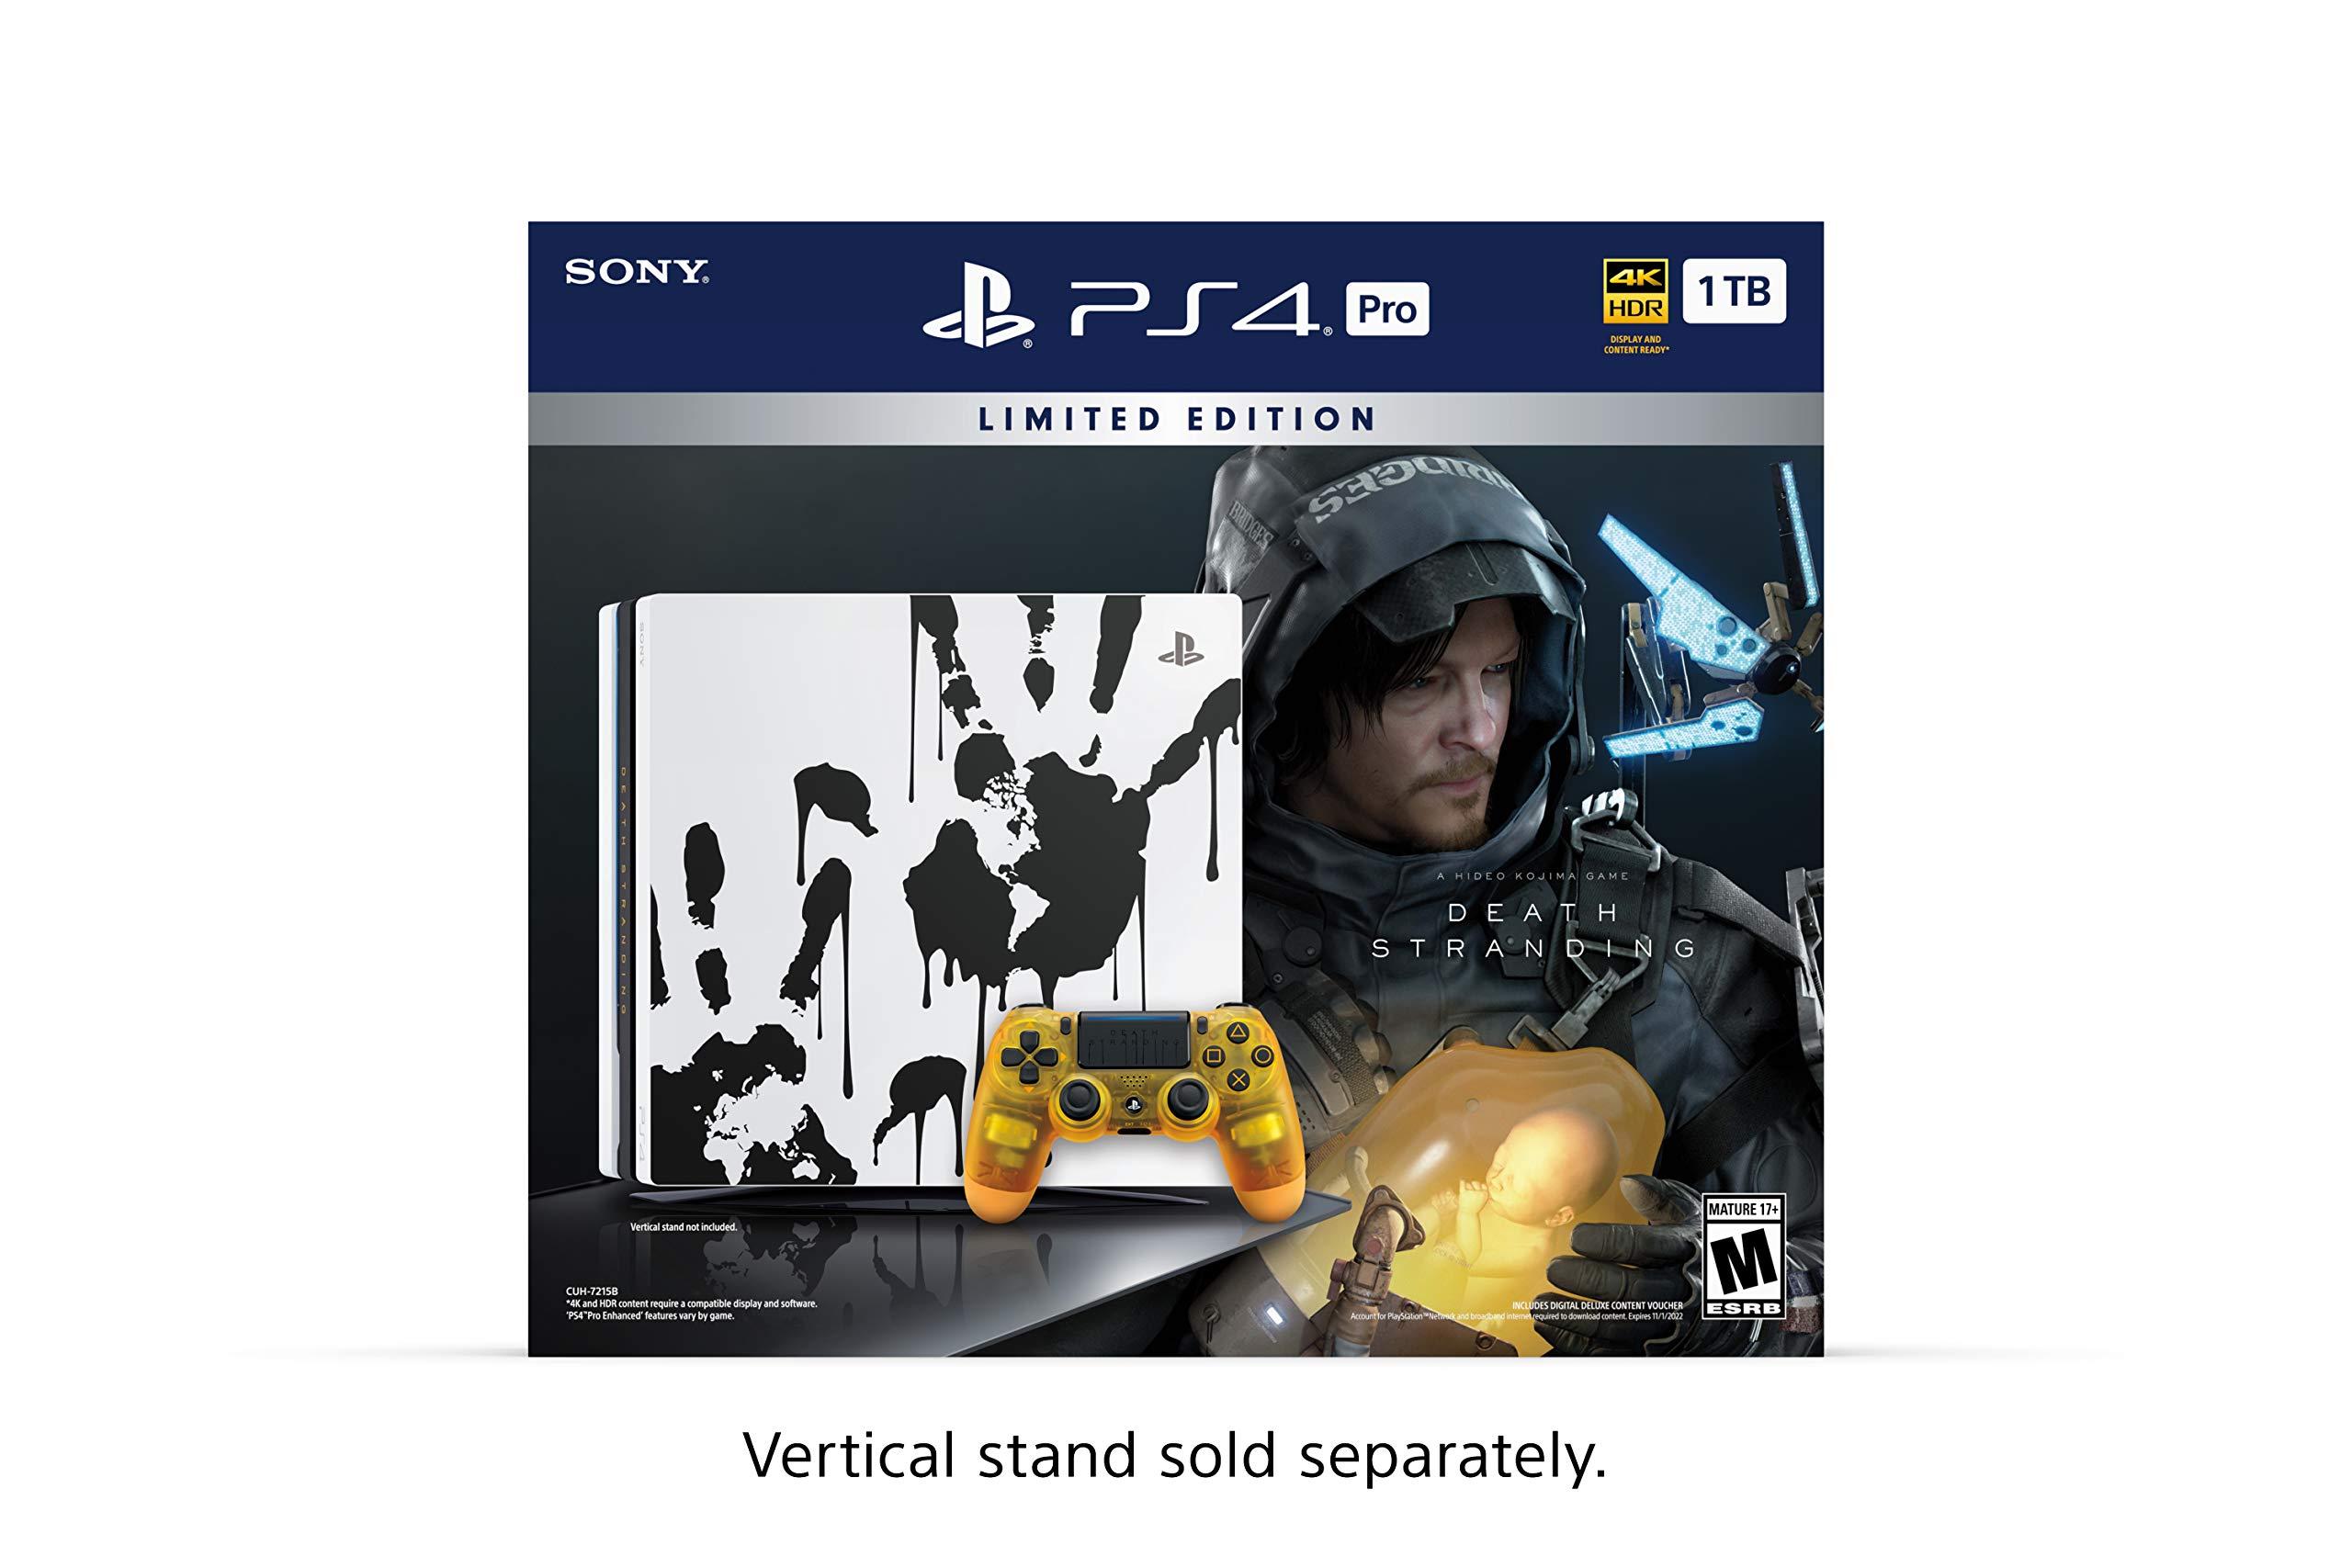 PlayStation 4 Pro 1TB Limited Edition Console – Death Stranding Bundle